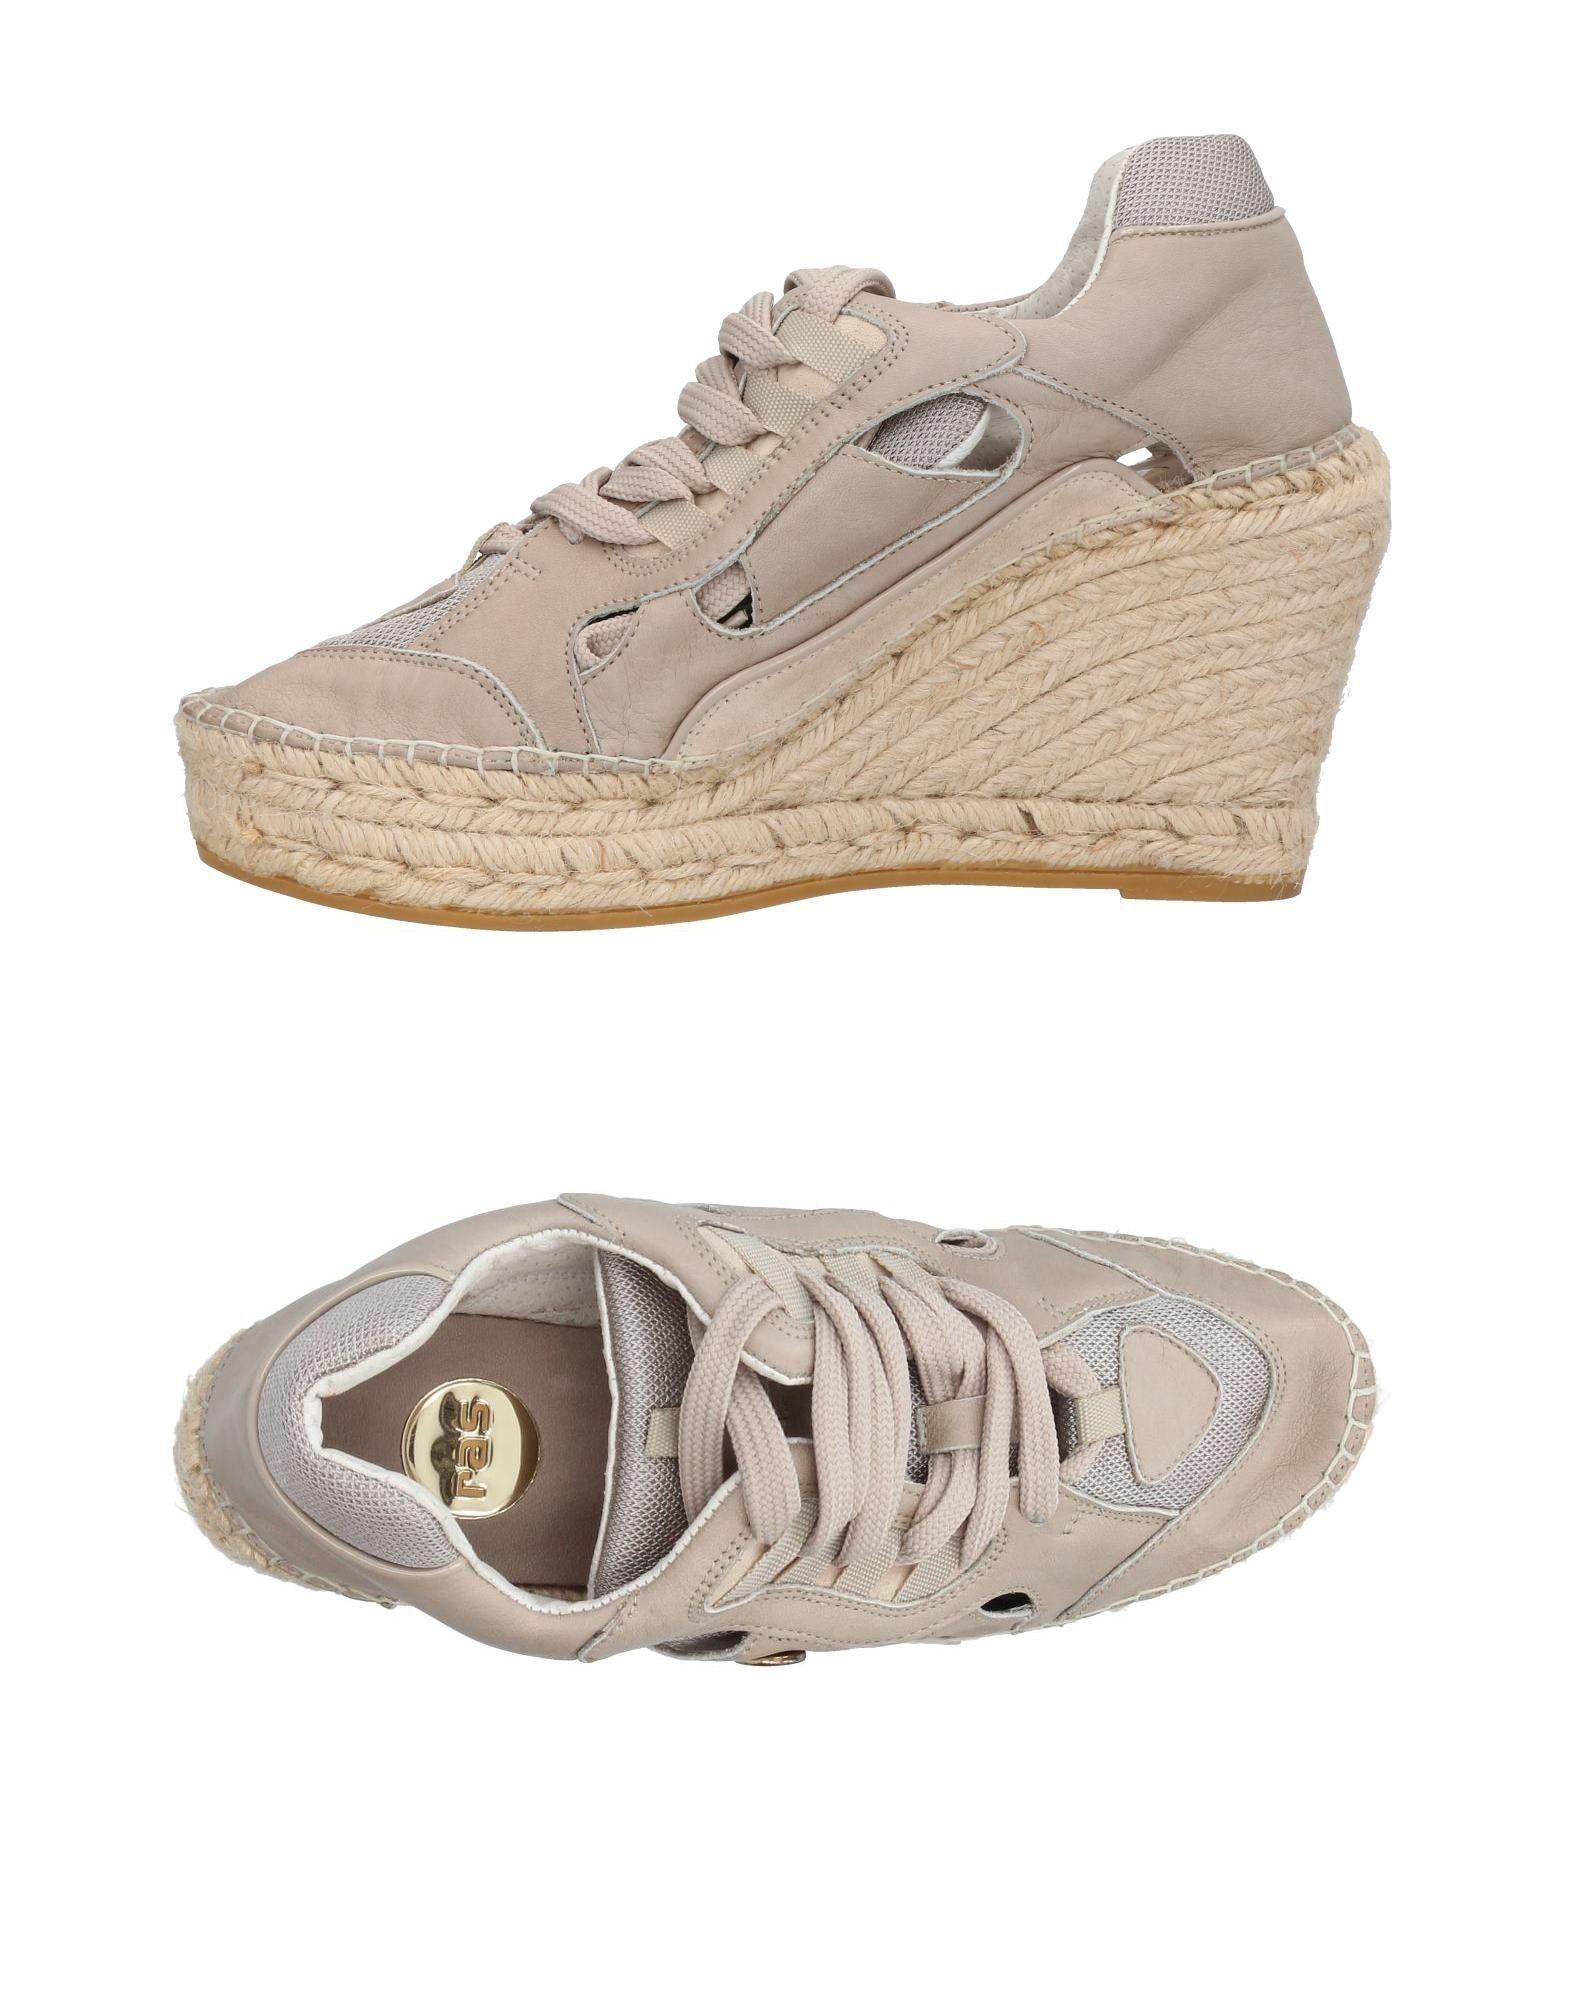 brooks низкие кеды и кроссовки RAS Низкие кеды и кроссовки